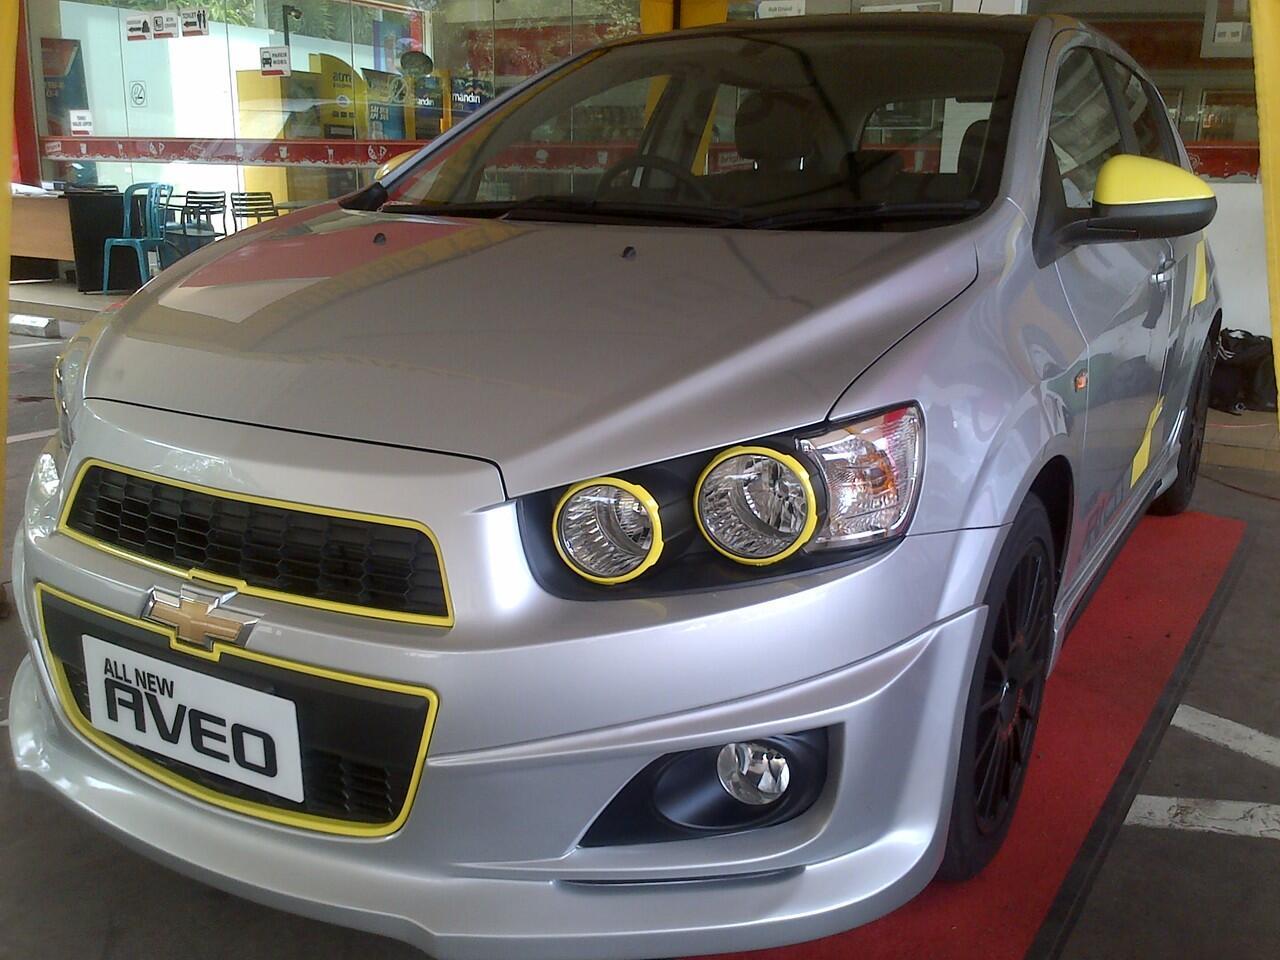 Chevrolet Aveo 1.4L LT MT